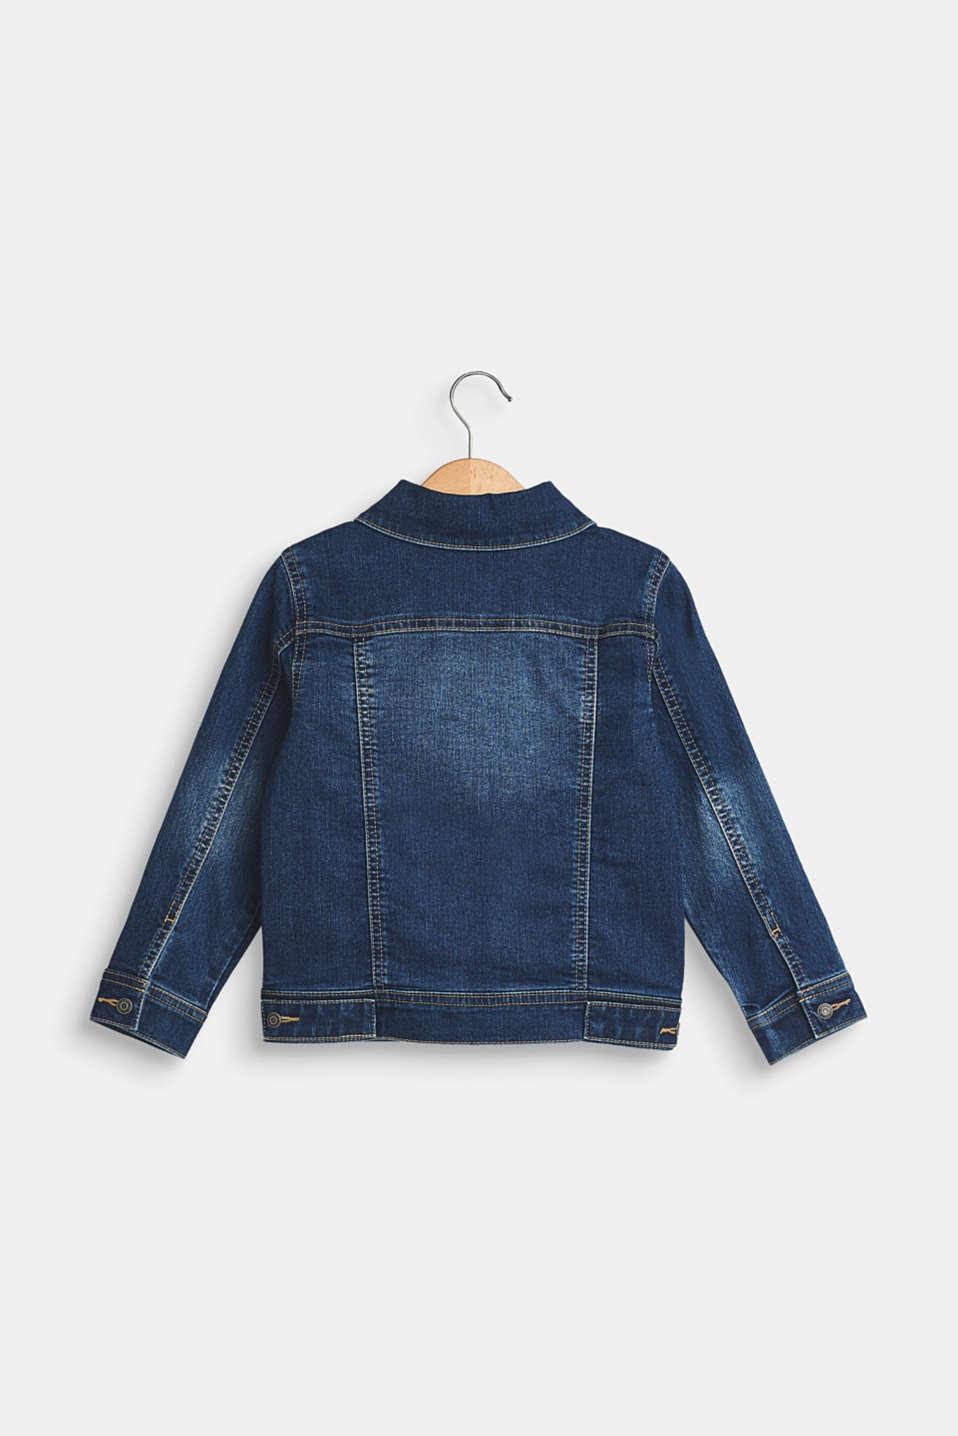 Stretch denim jacket with garment-washed effects, MEDIUM WASH DE, detail image number 1